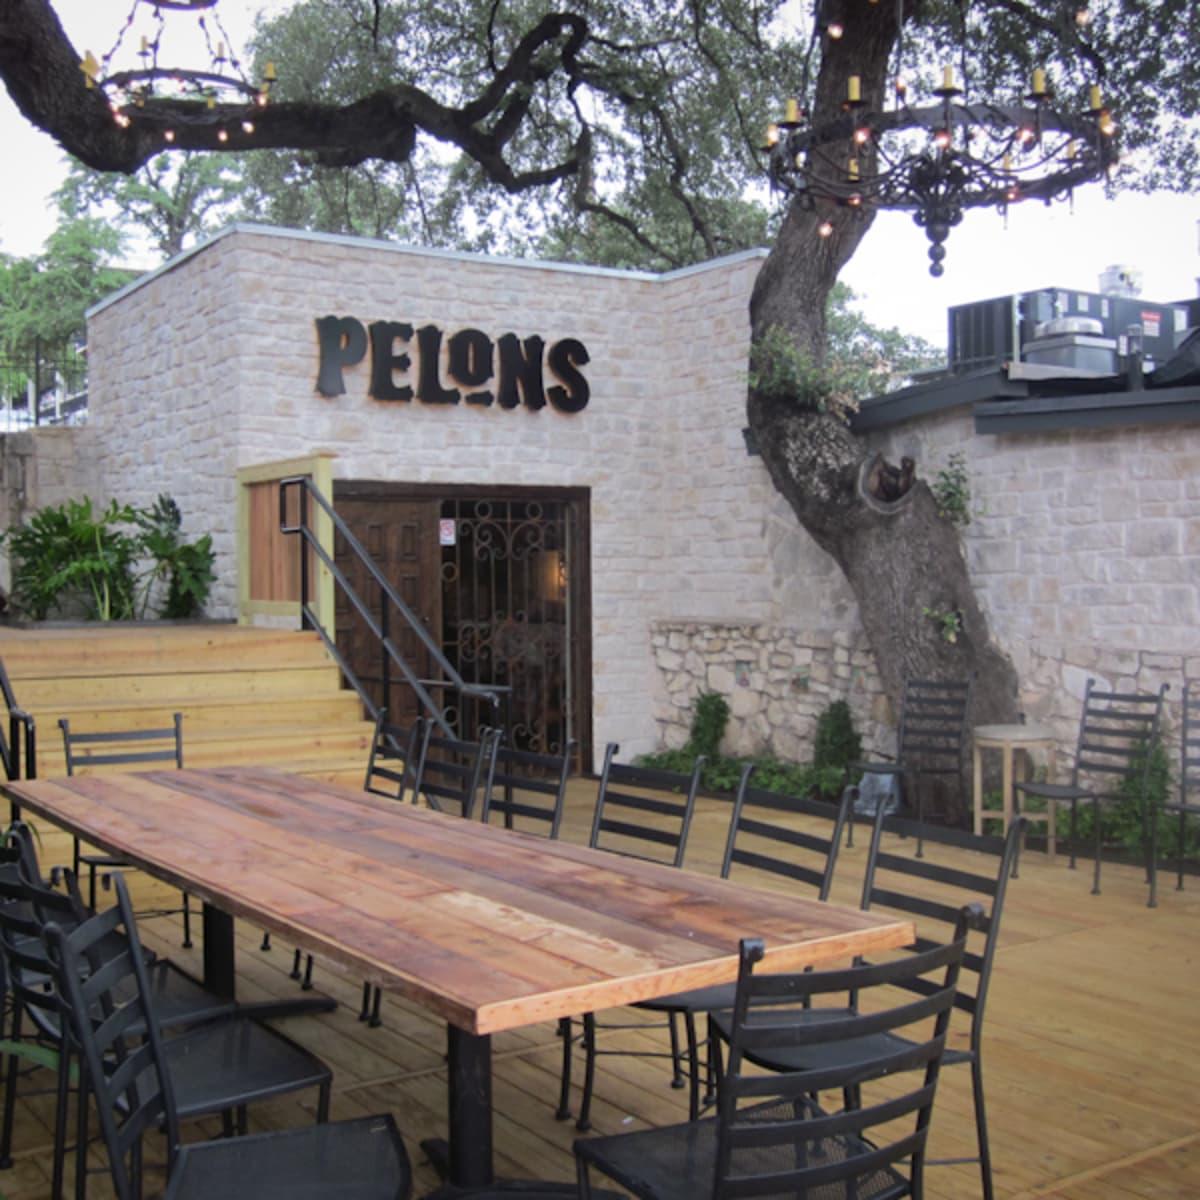 Austin Photo Set: News_Layne_pelons_may 2012_exterior day